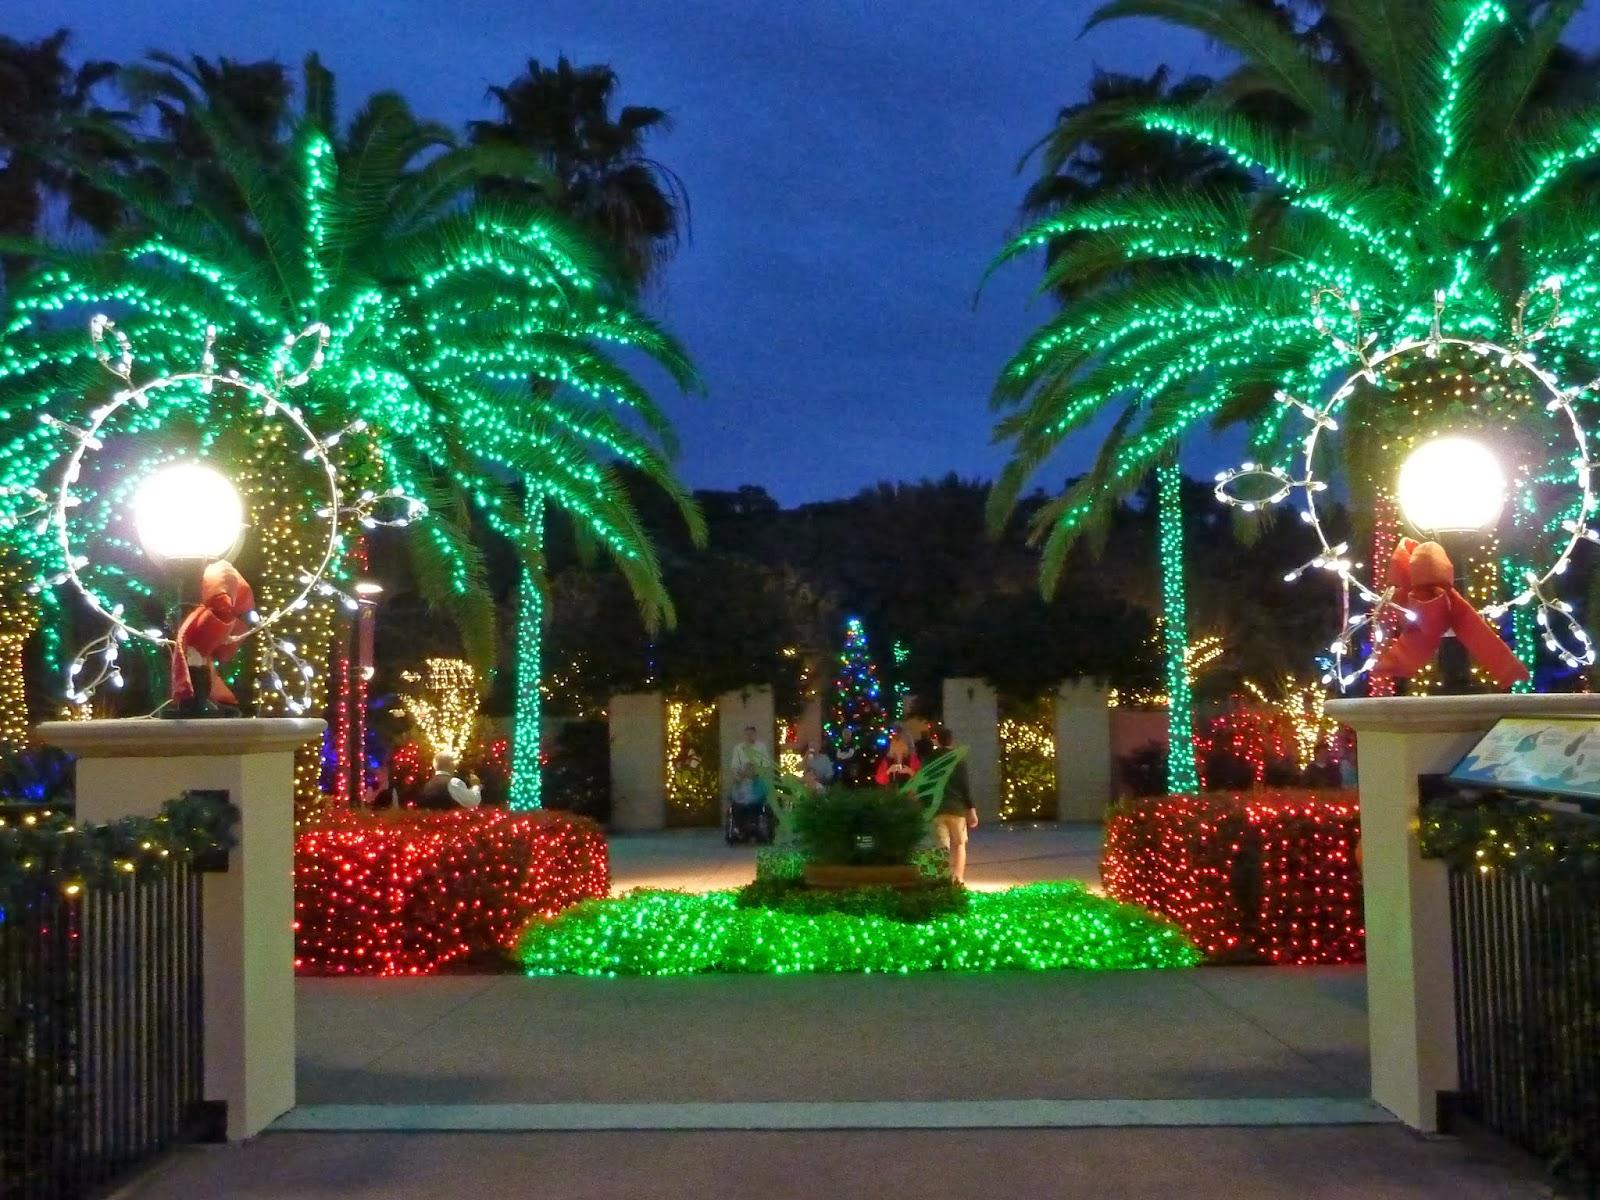 Dream chaser brrr mn was cold back to florida - Florida botanical gardens christmas lights ...